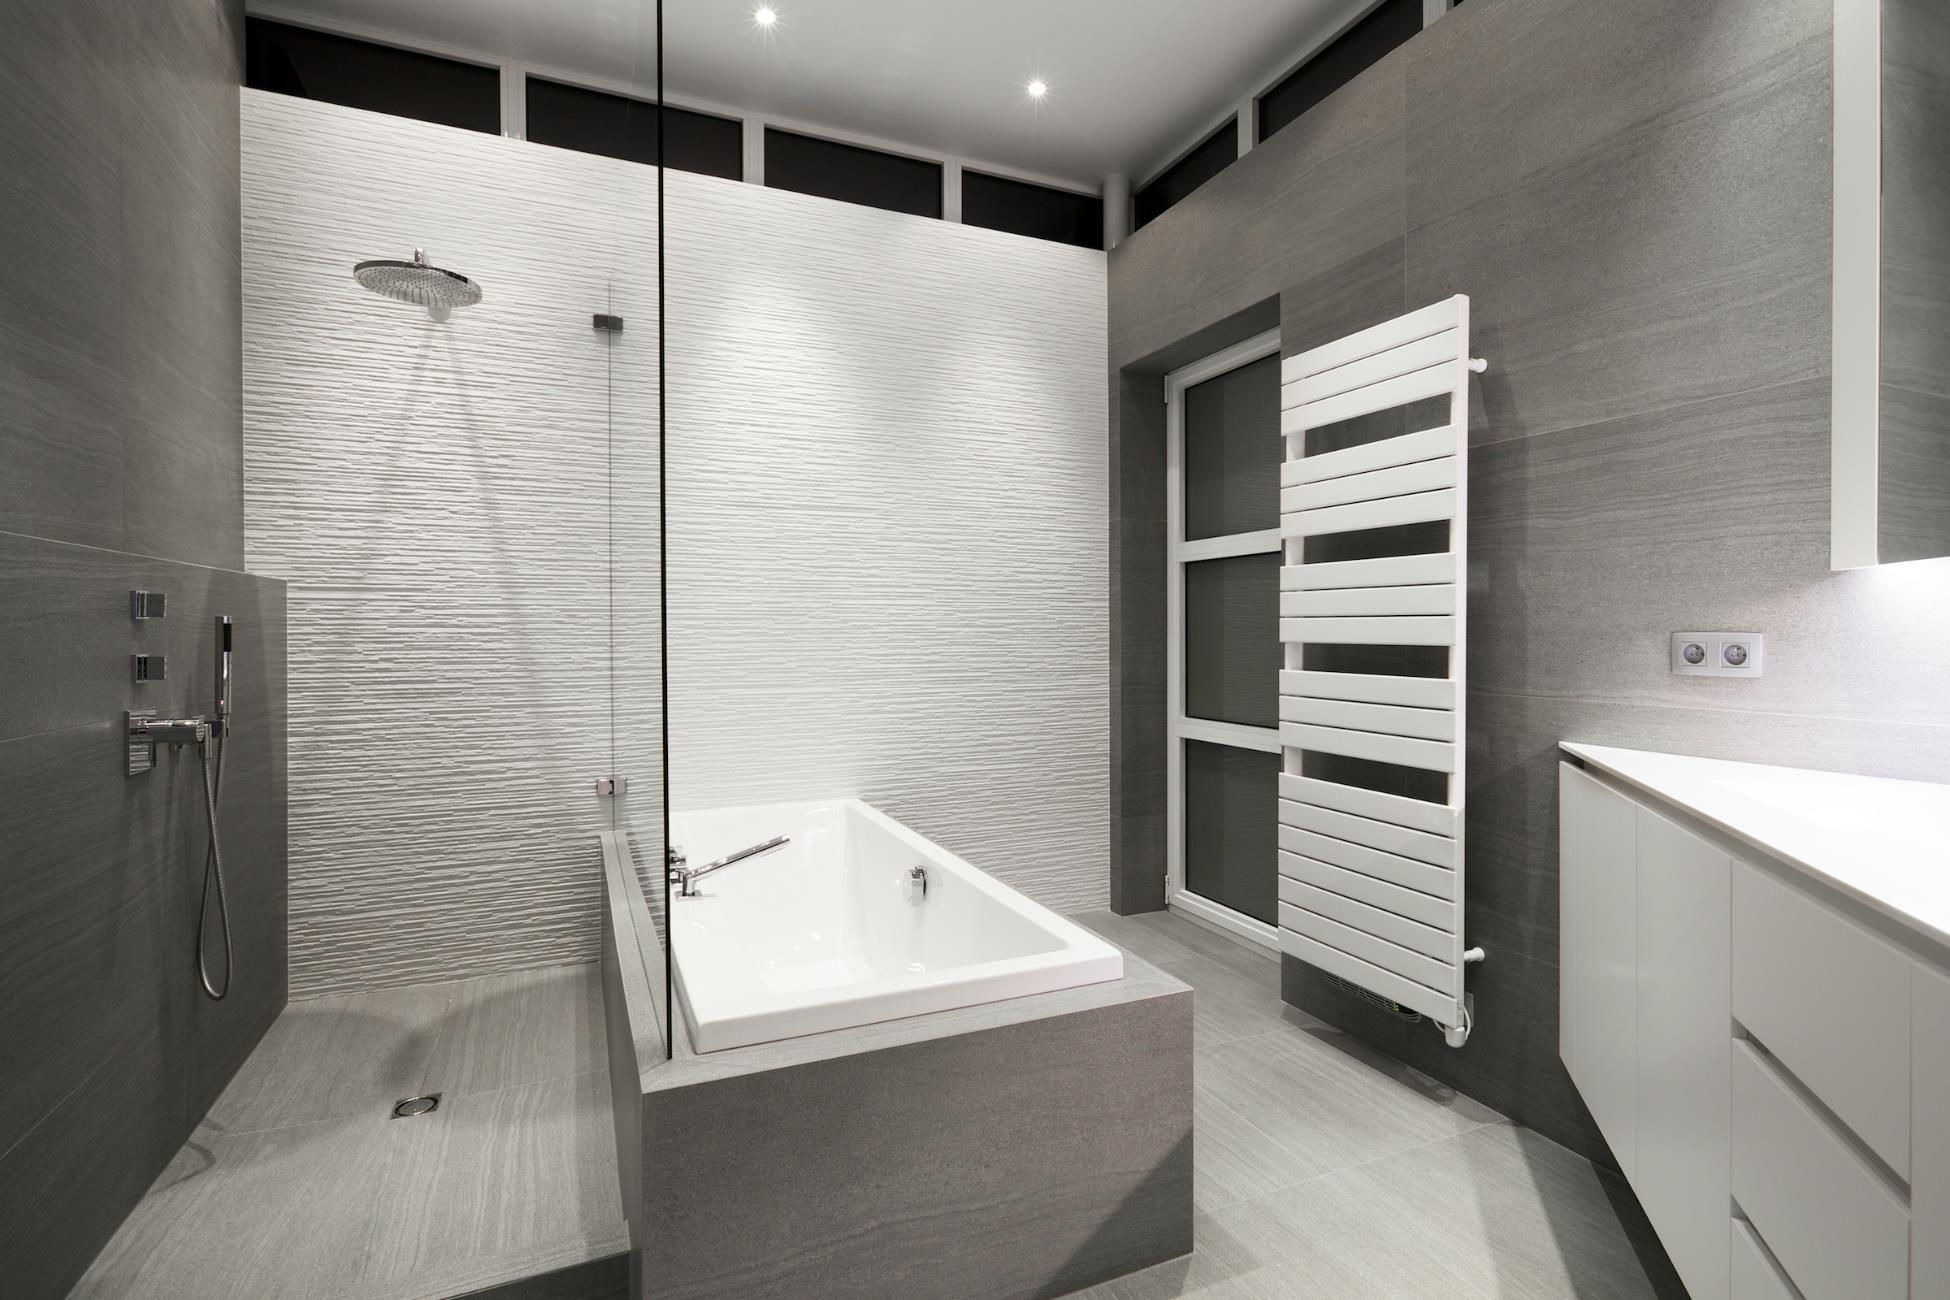 salle de bain haut de gamme avec douche